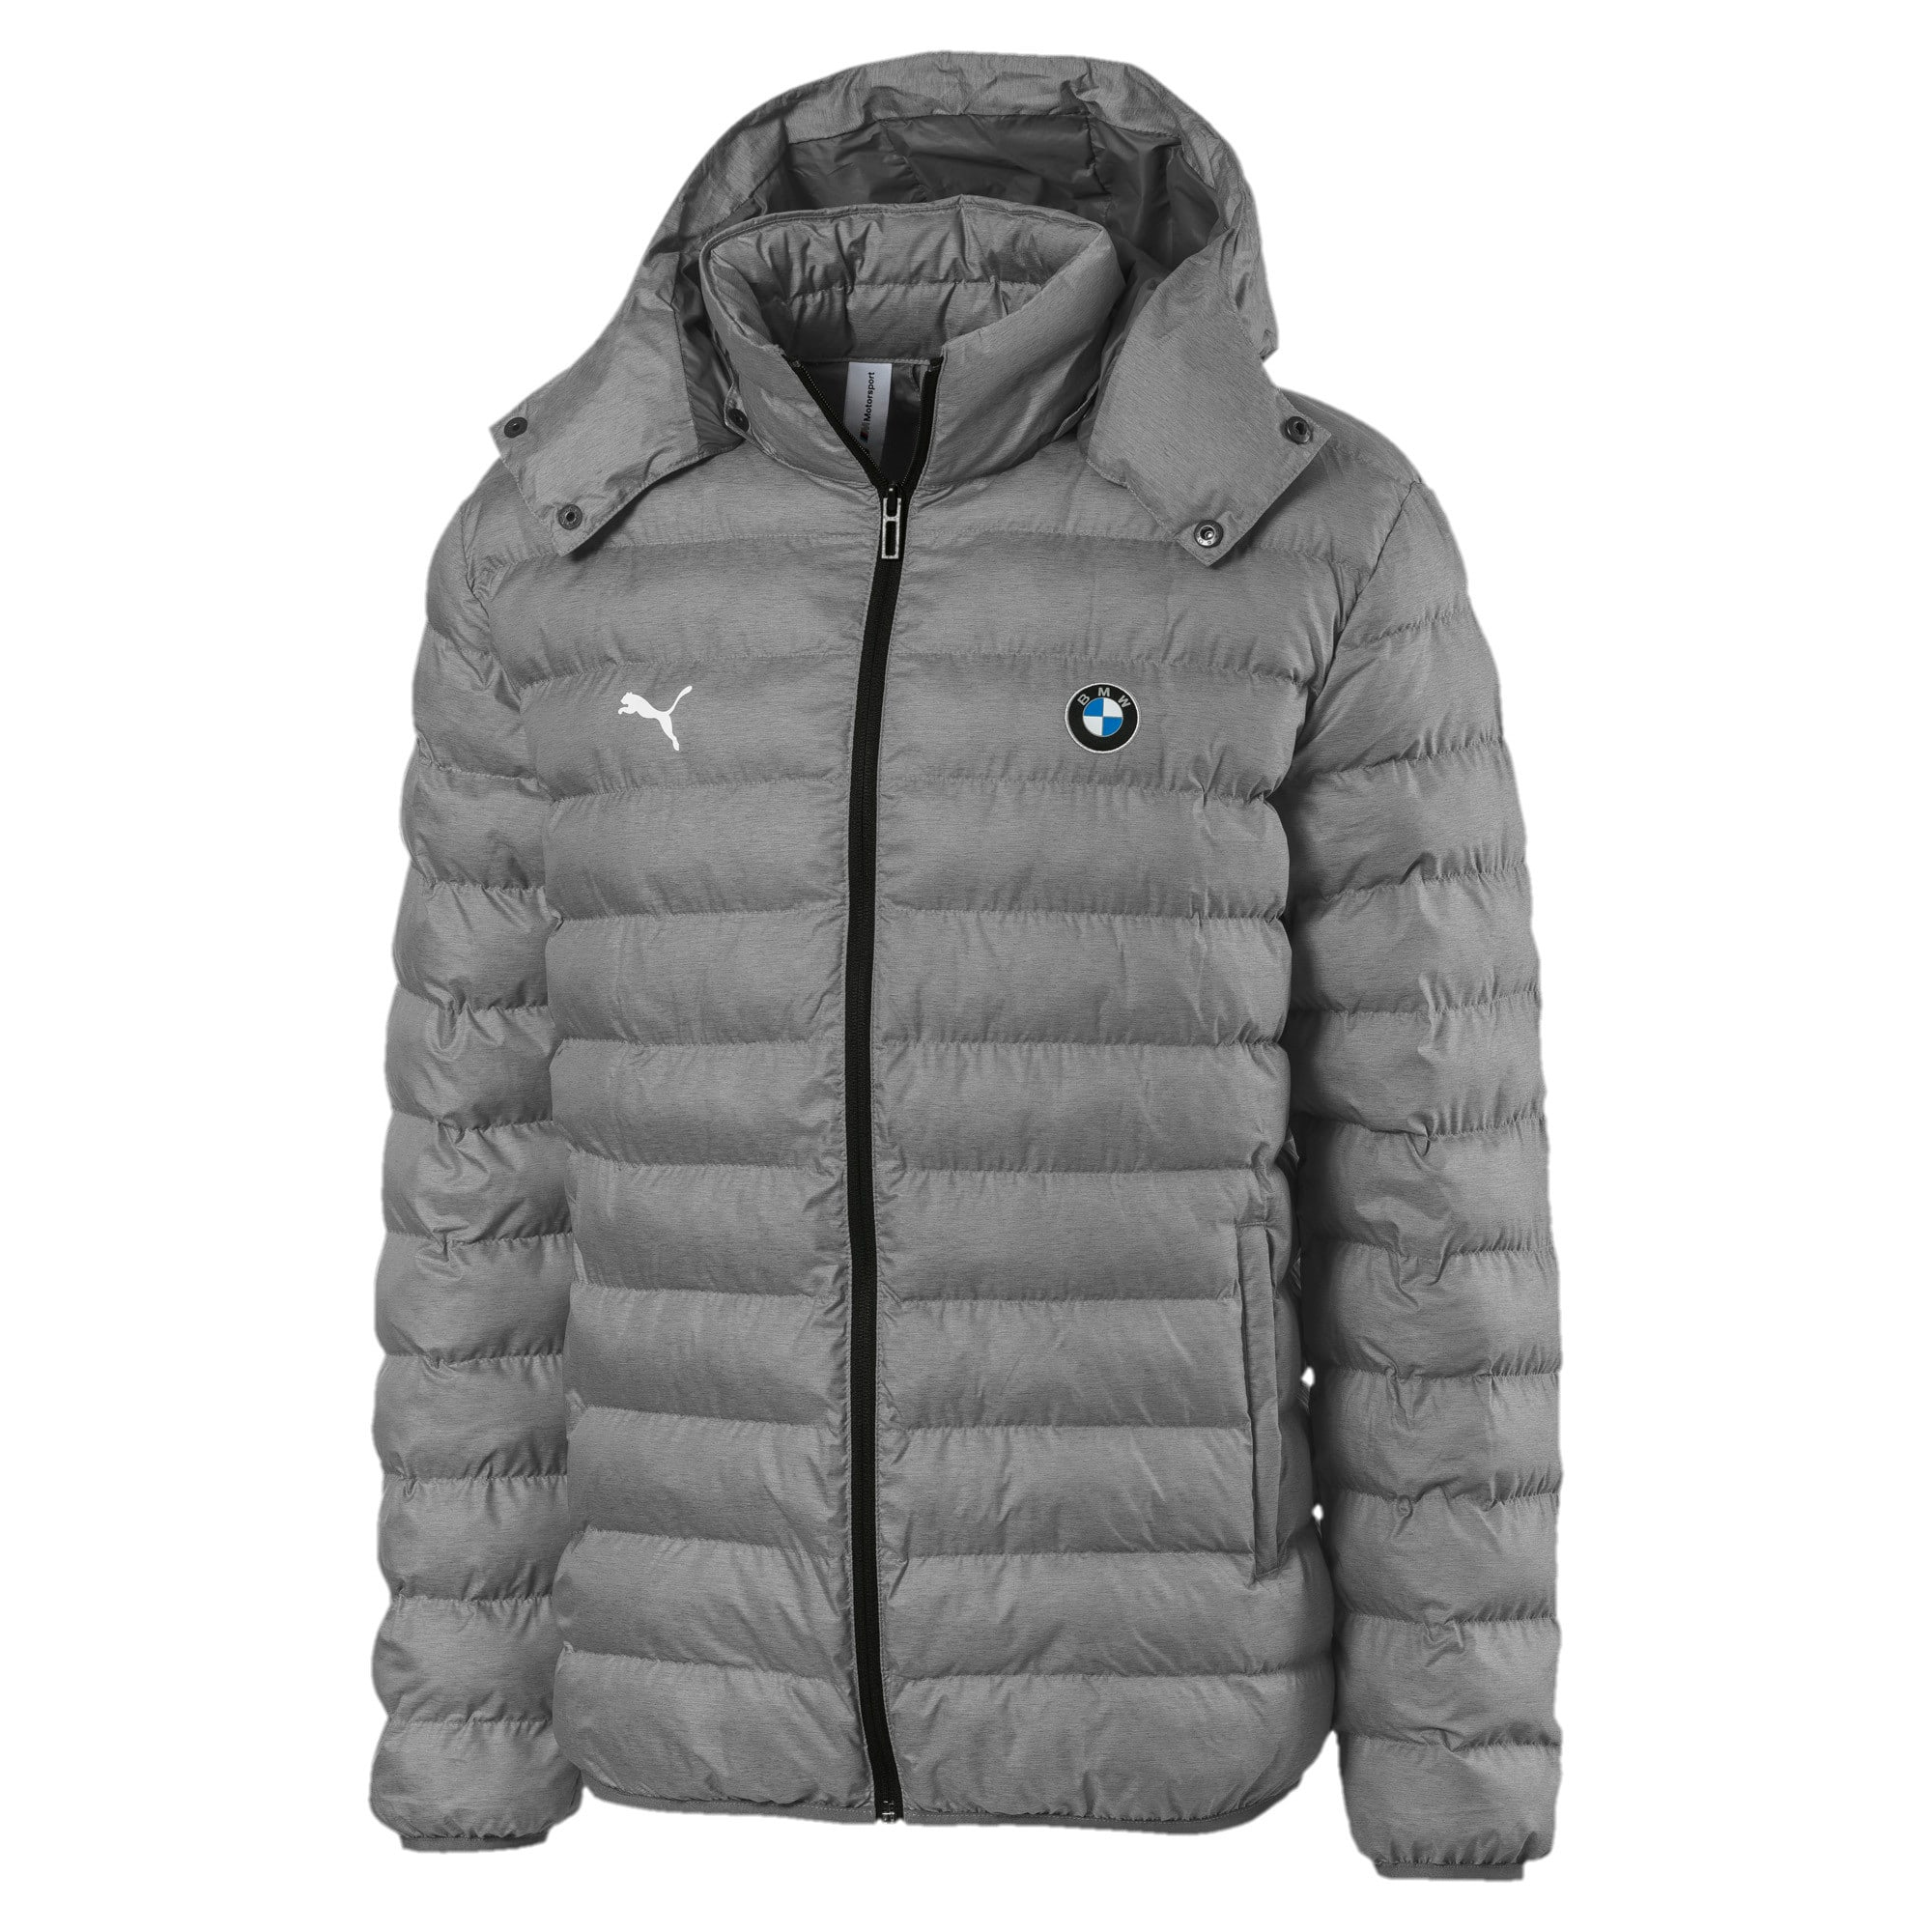 Thumbnail 5 of BMW Motorsport Eco PackLite Men's Jacket, Medium Gray Heather, medium